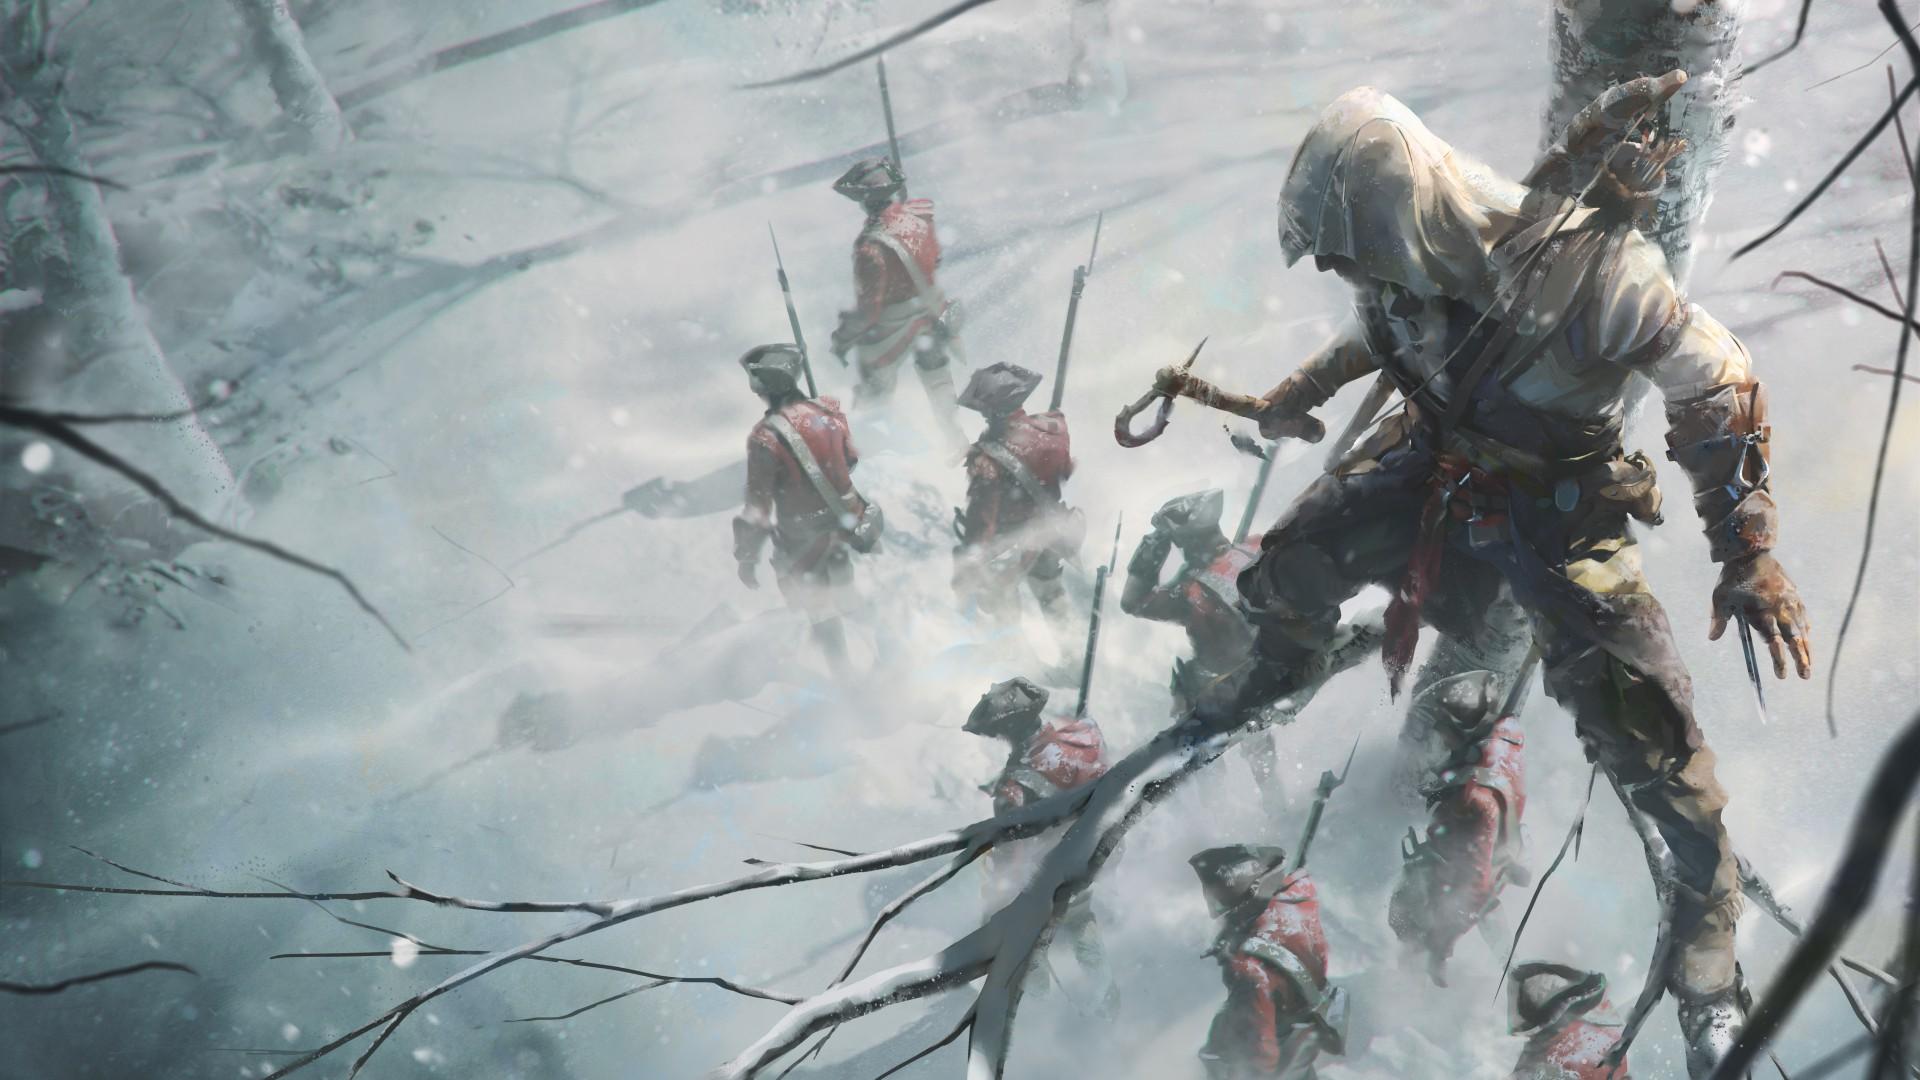 Art - Assassin's Creed 3 Арт